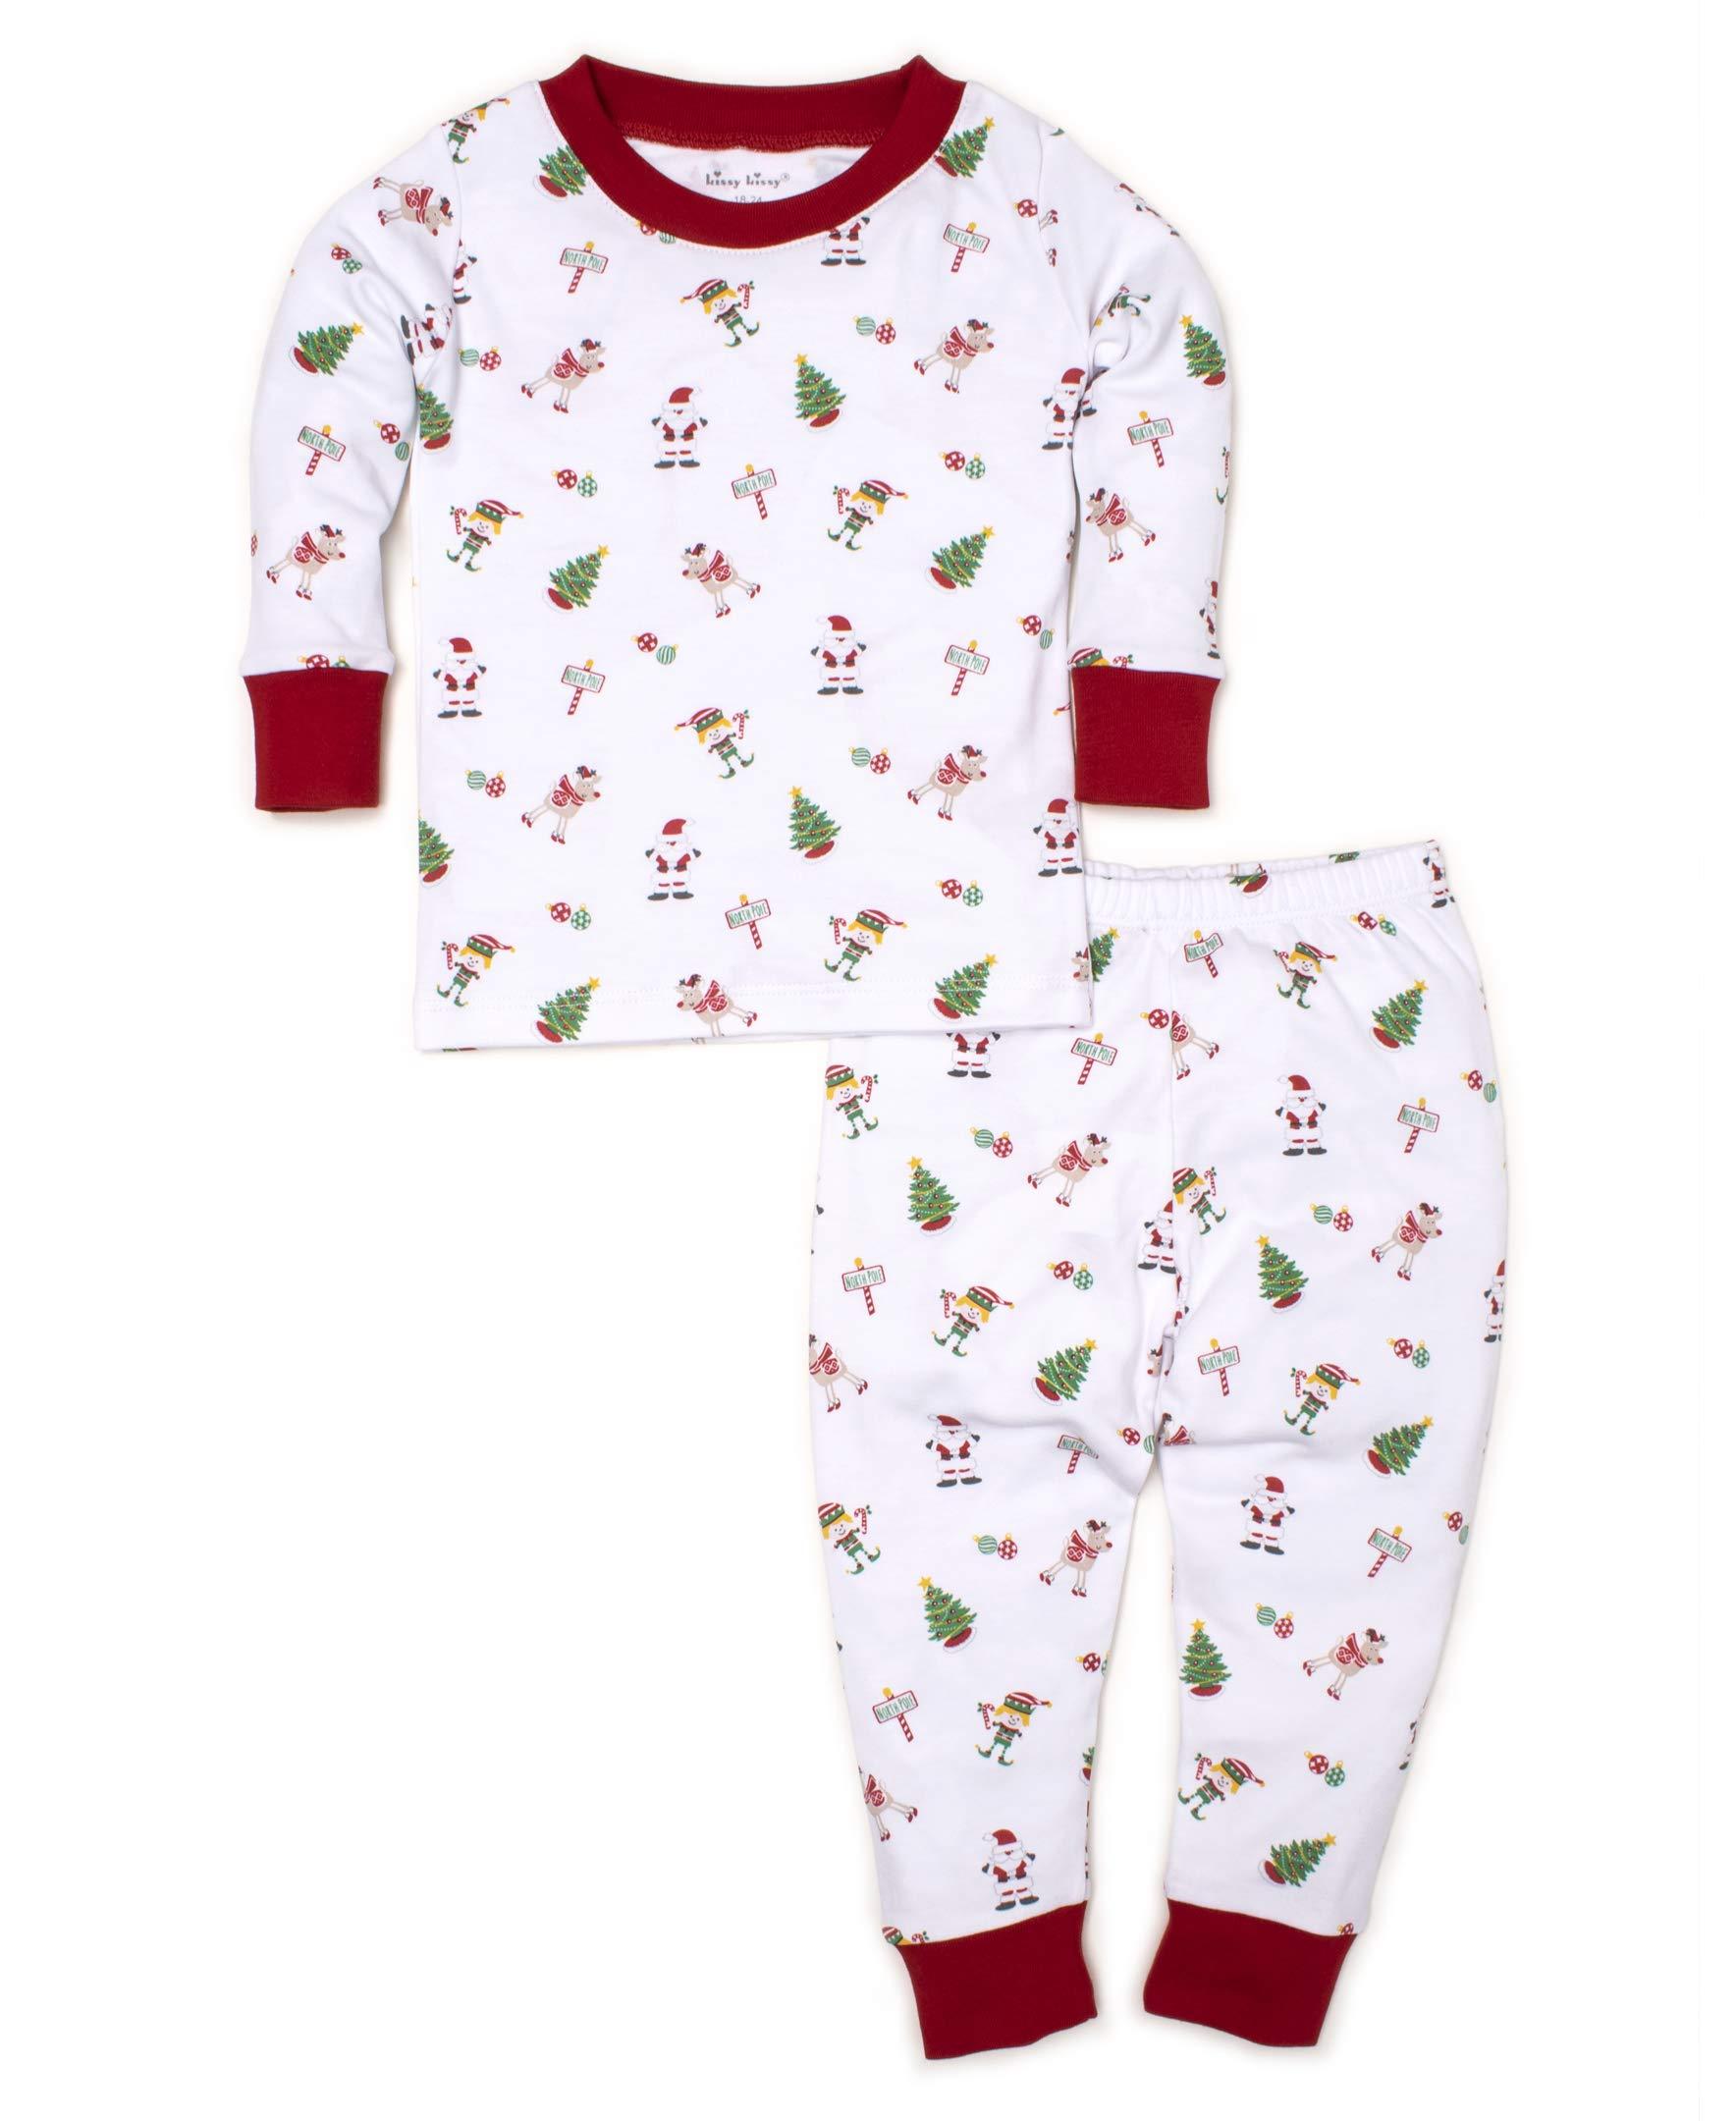 Kissy Kissy Unisex Baby Holidaze - Print Pajama Set - Snug Fit-6 by Kissy Kissy